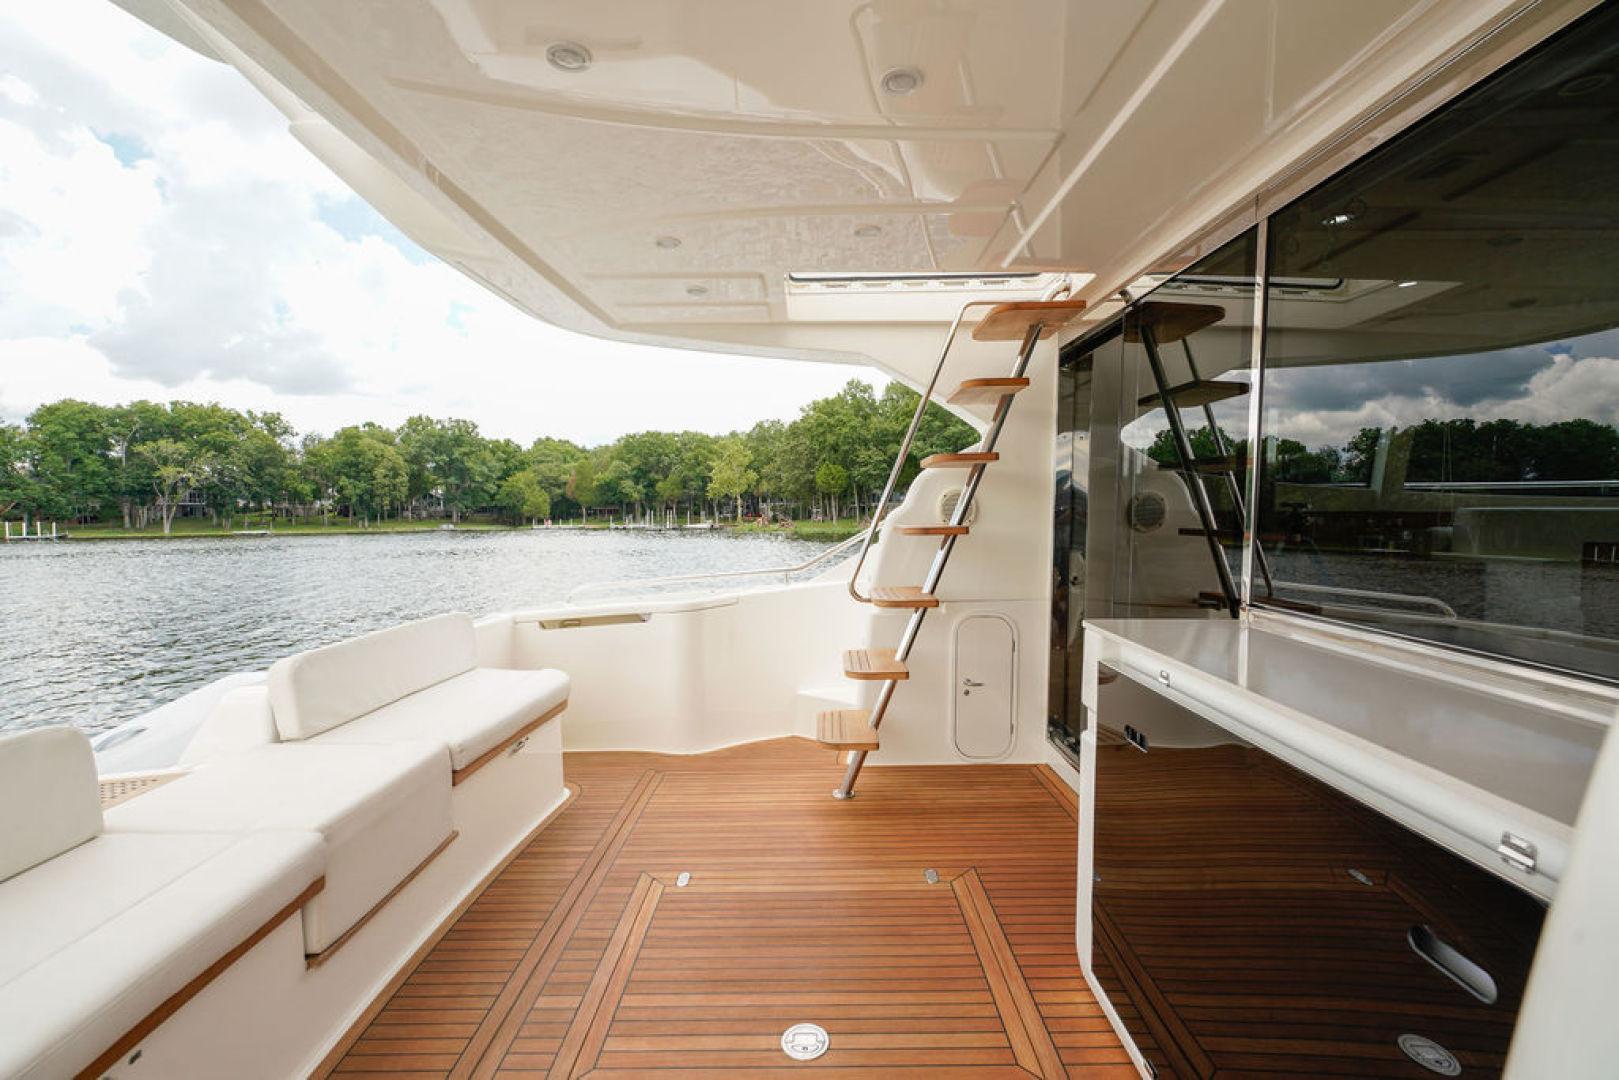 Ferretti Yachts-530 2013-ISLAND GIRL Mount Juliet-Tennessee-United States-1574686   Thumbnail